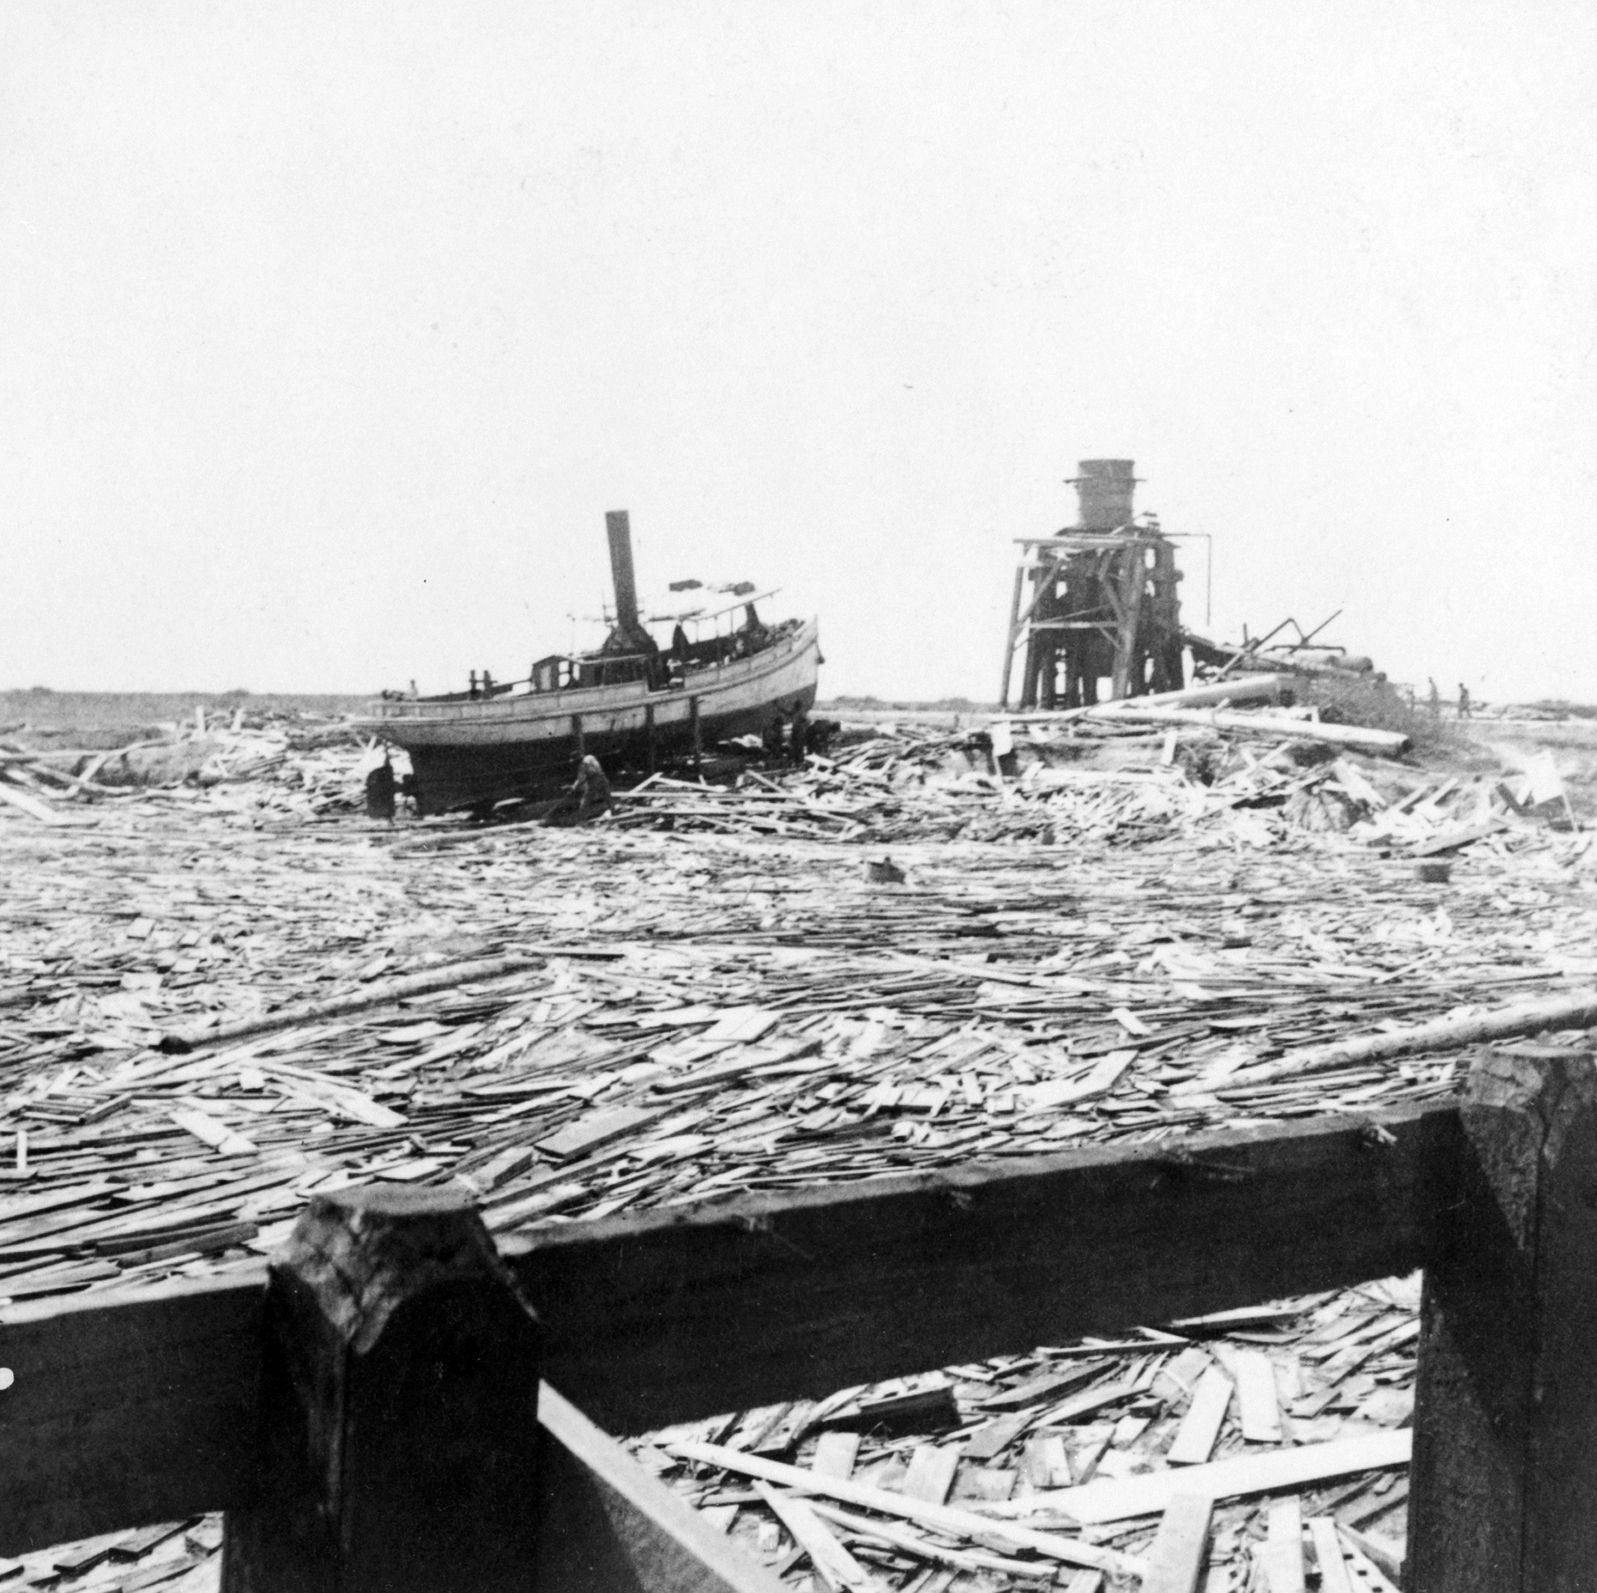 1900 Galveston Hurricane Photos File Floating Wreckage Galveston Hurricane 1900 Jpg Wikipedia The Galveston Hurricane Galveston 1900 Galveston Hurricane